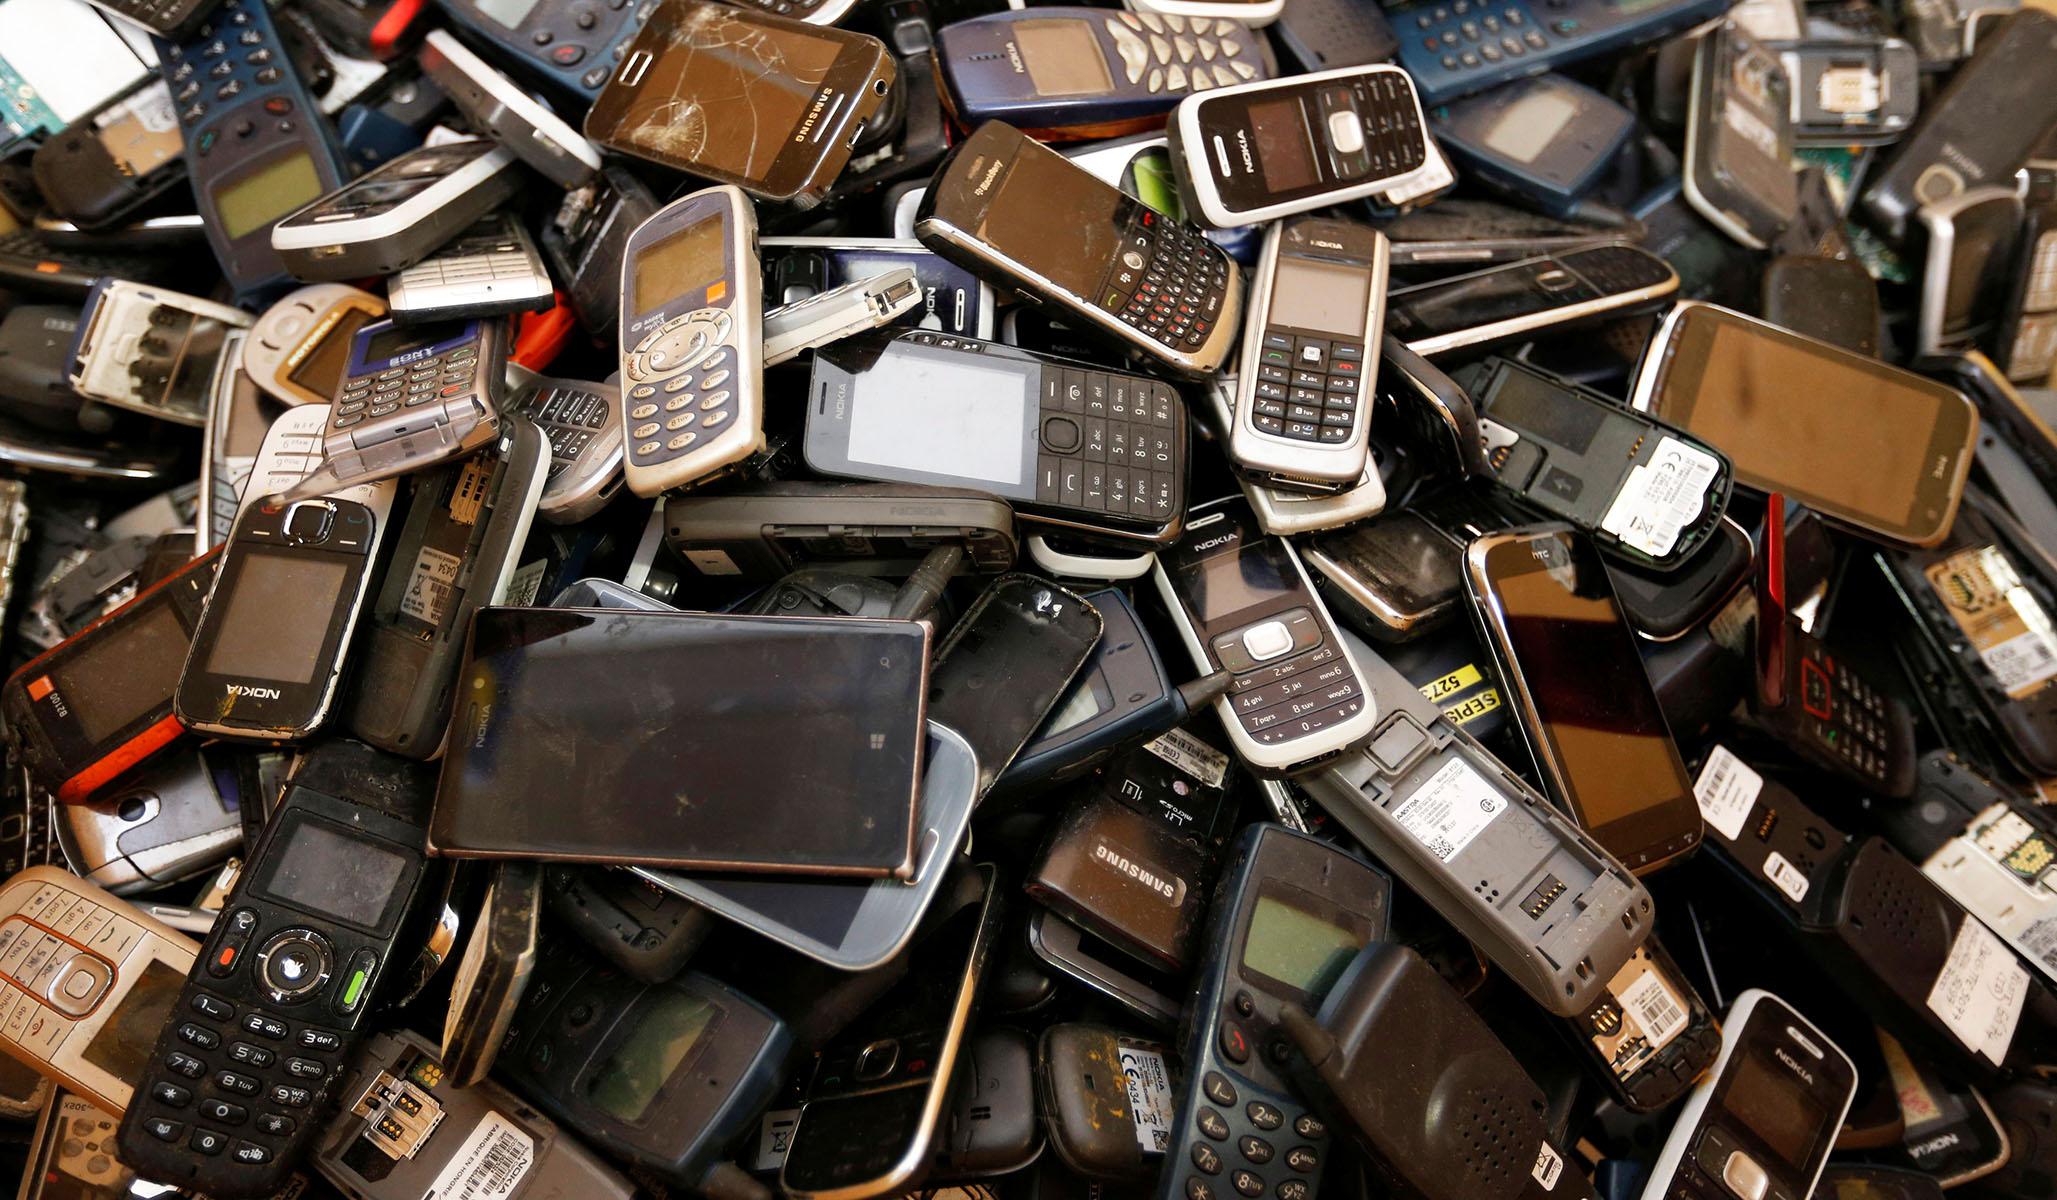 Leaked Data Set Reveals Individual Tracking of 12 Million Phones